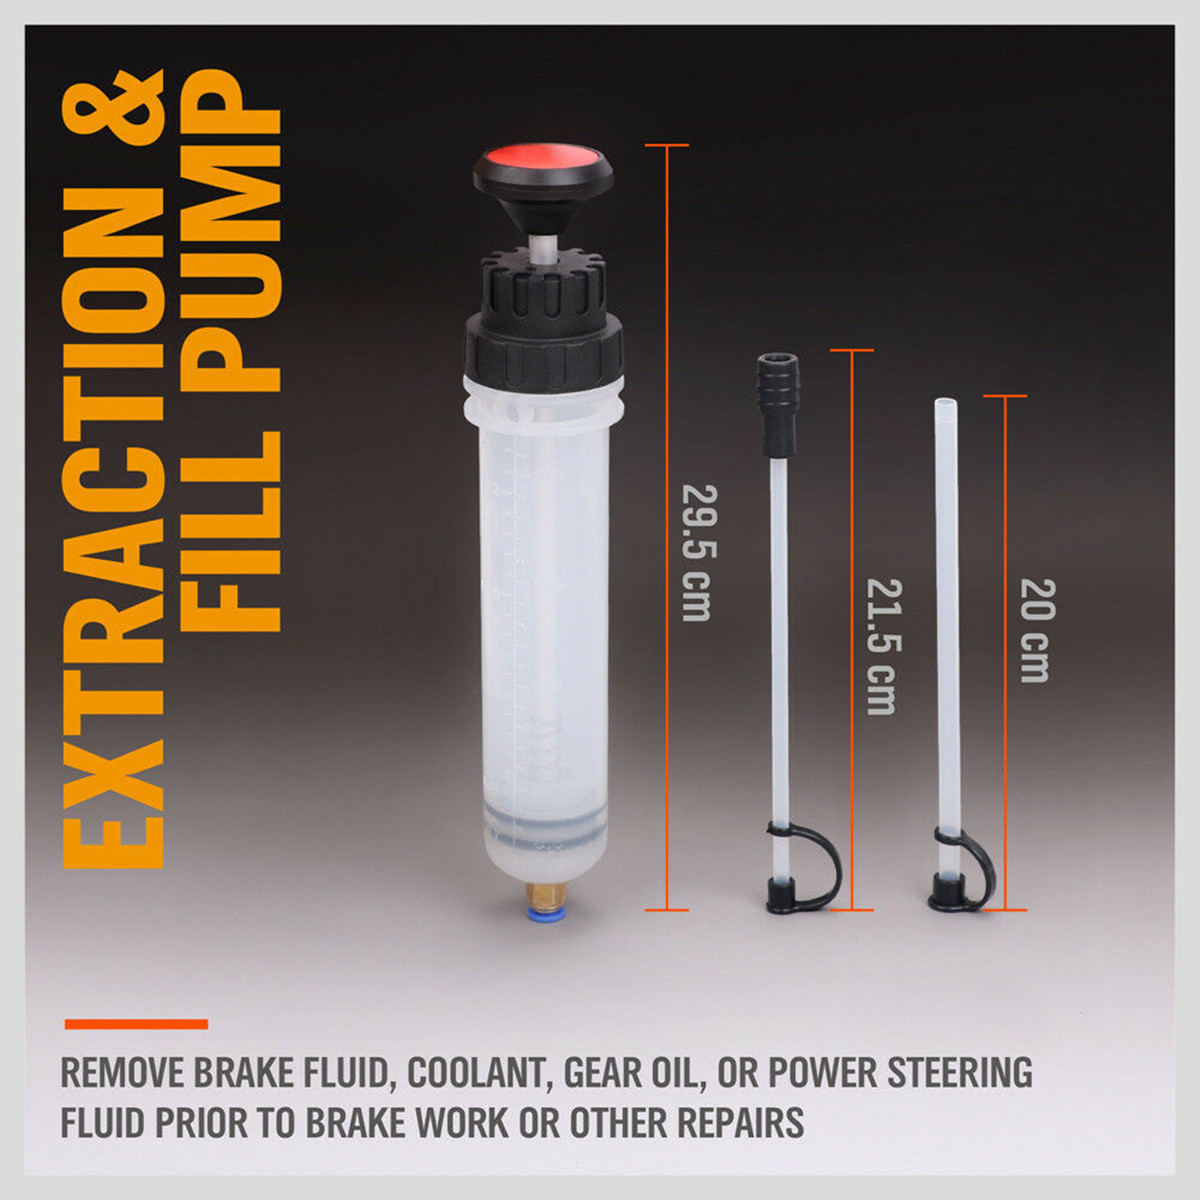 200cc Oil Fluid Extractor & Filling Syringe Bottle Transfer Hand Pump Automotive Fluid Extraction Car Fuel Pump Car Styling